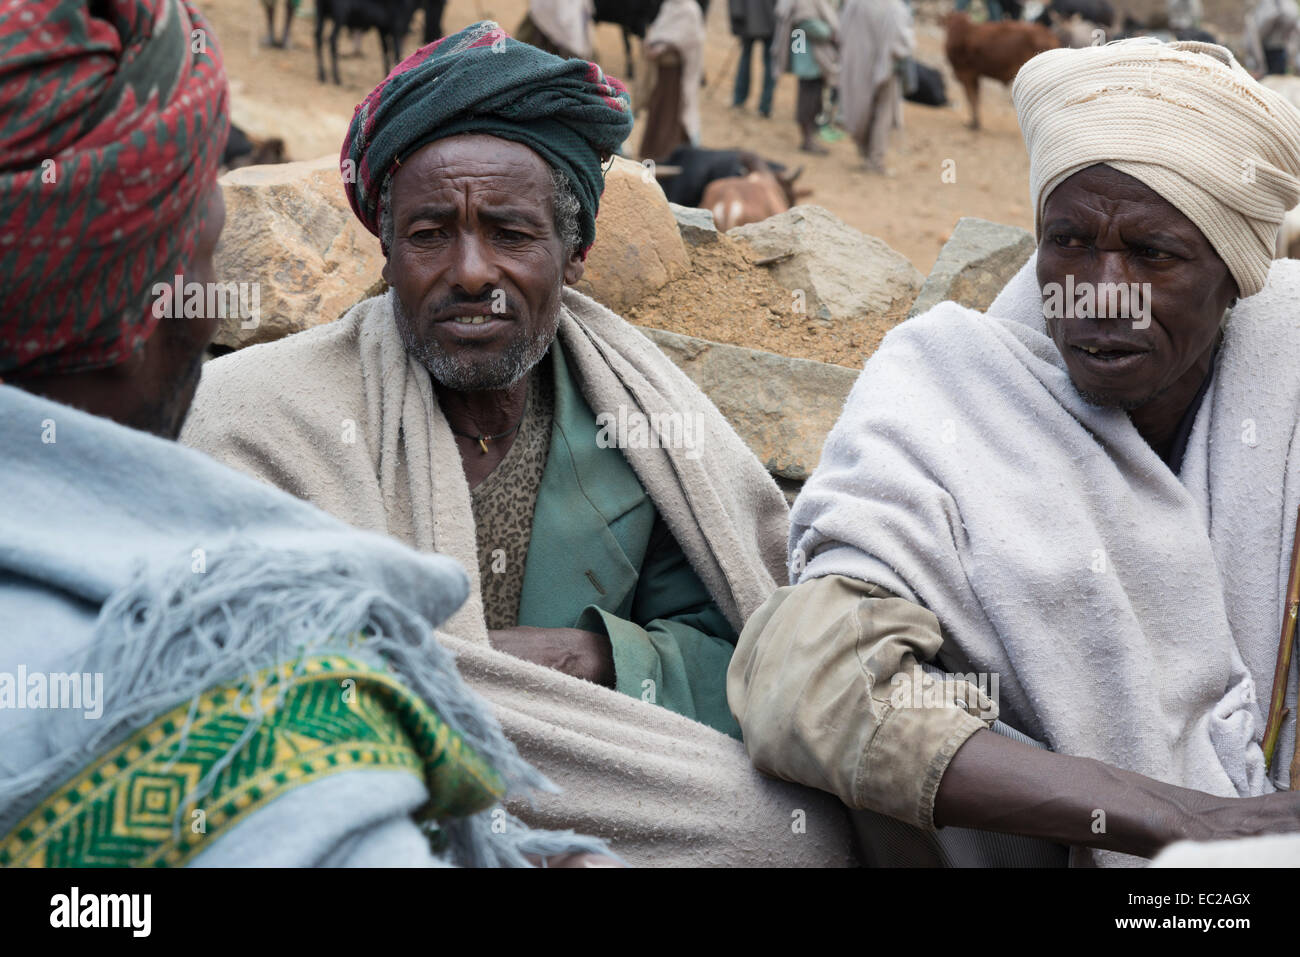 Farmers. Abuna Yosef. Lalibela area. Northern Ethiopia. - Stock Image